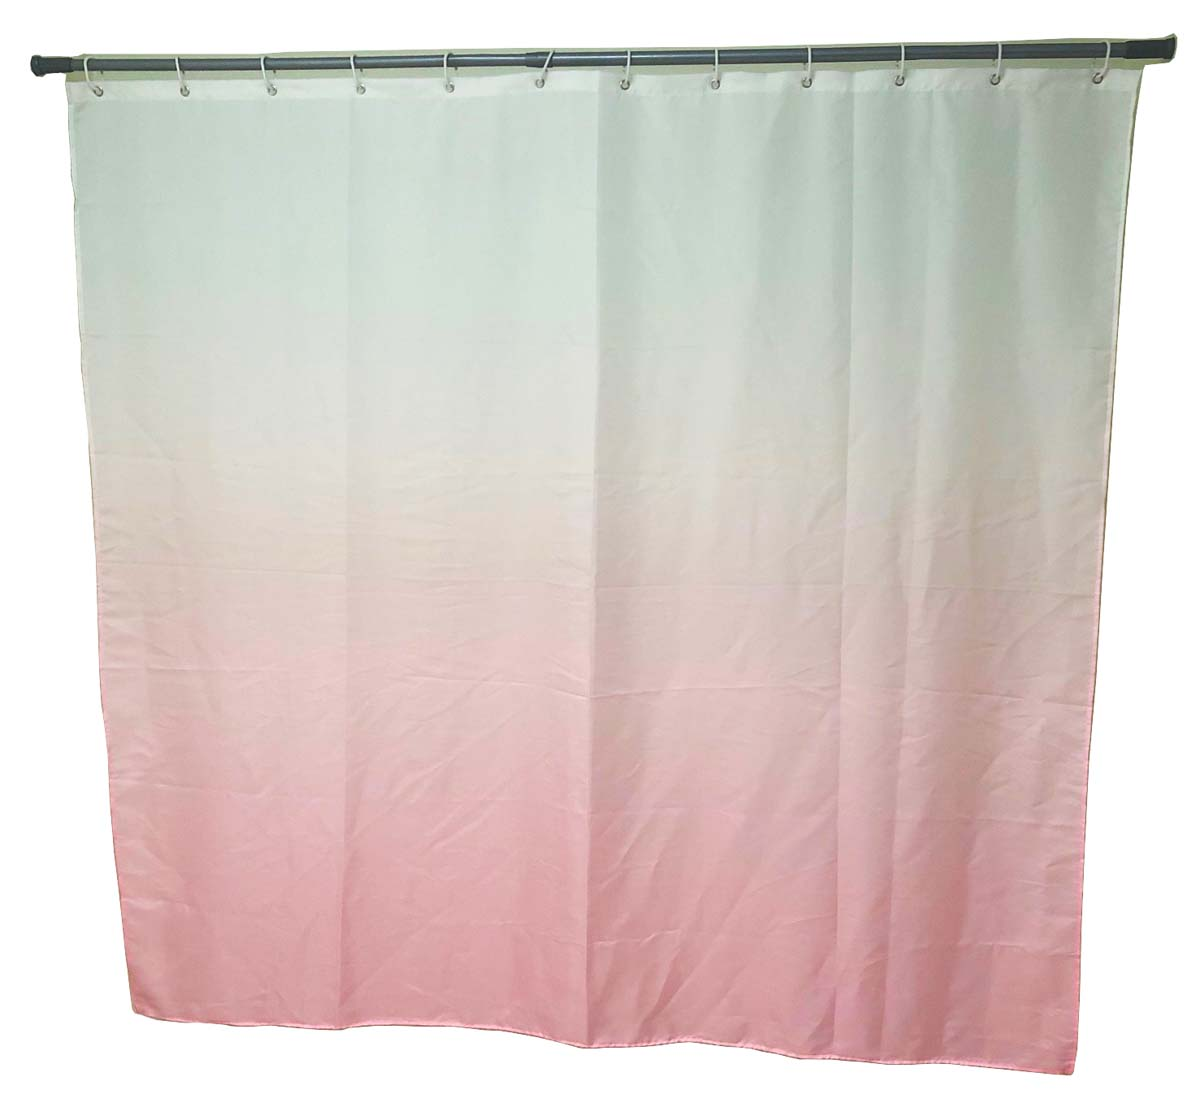 Штора для ванной Swensa Gradient, цвет: розовый, 180 х 180 см штора для ванной swensa бамбук цвет зеленый 180 х 180 см